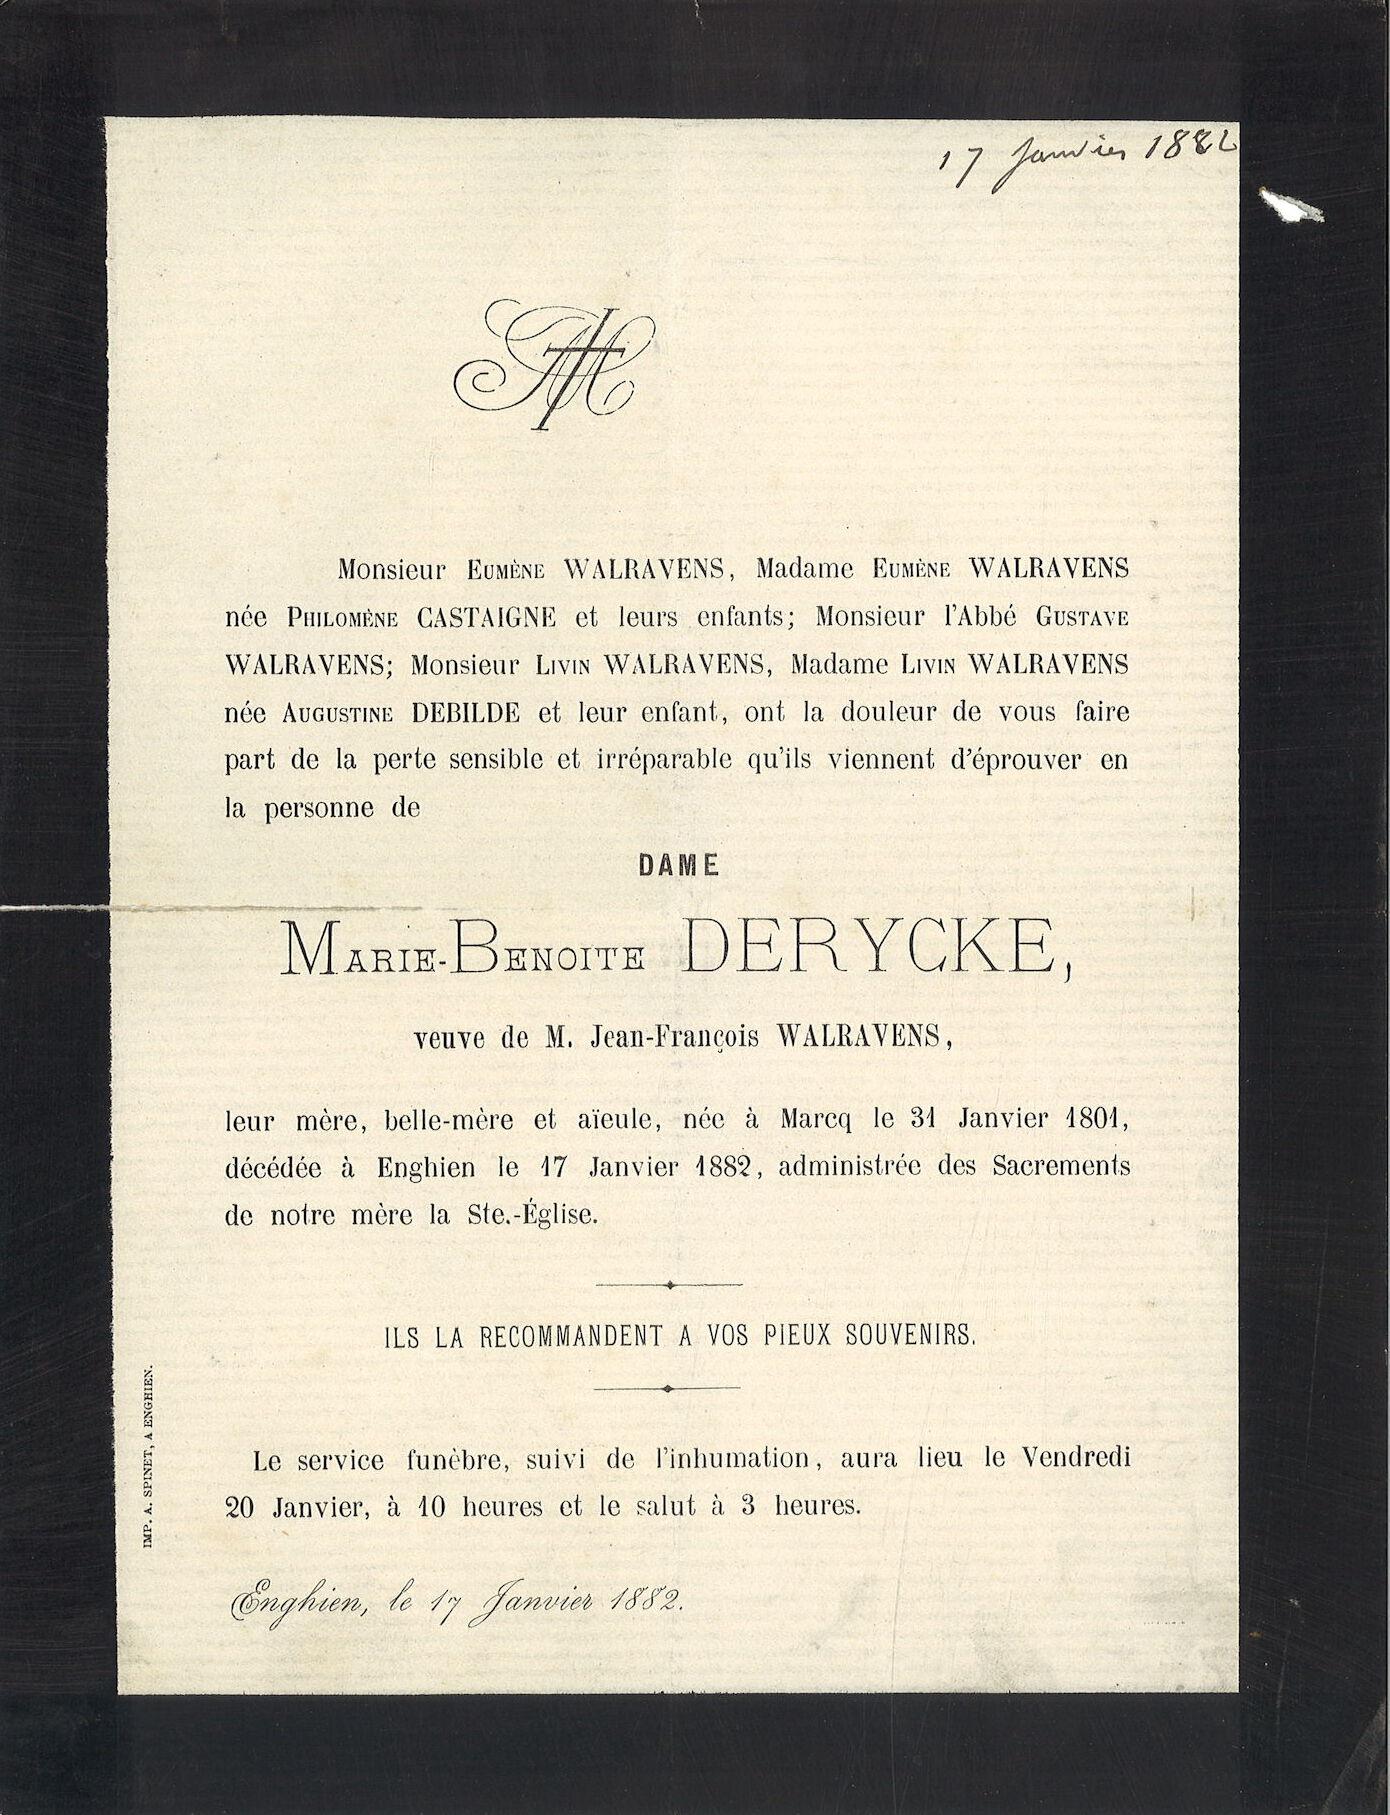 Marie-Benoite Derycke